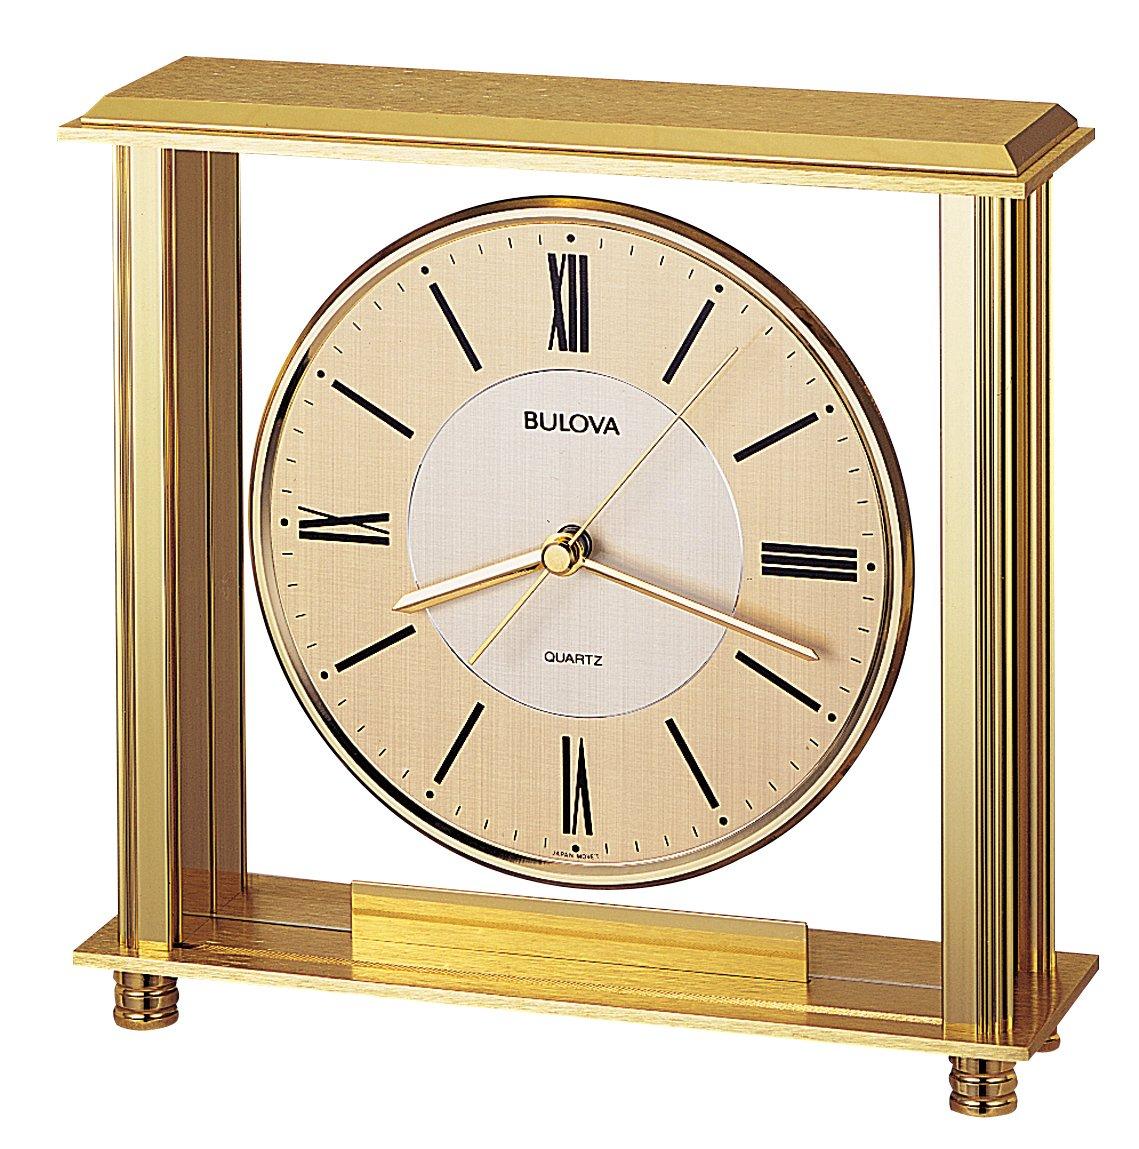 Amazon.com: Grand Prix computadora Reloj by Bulova: Home ...